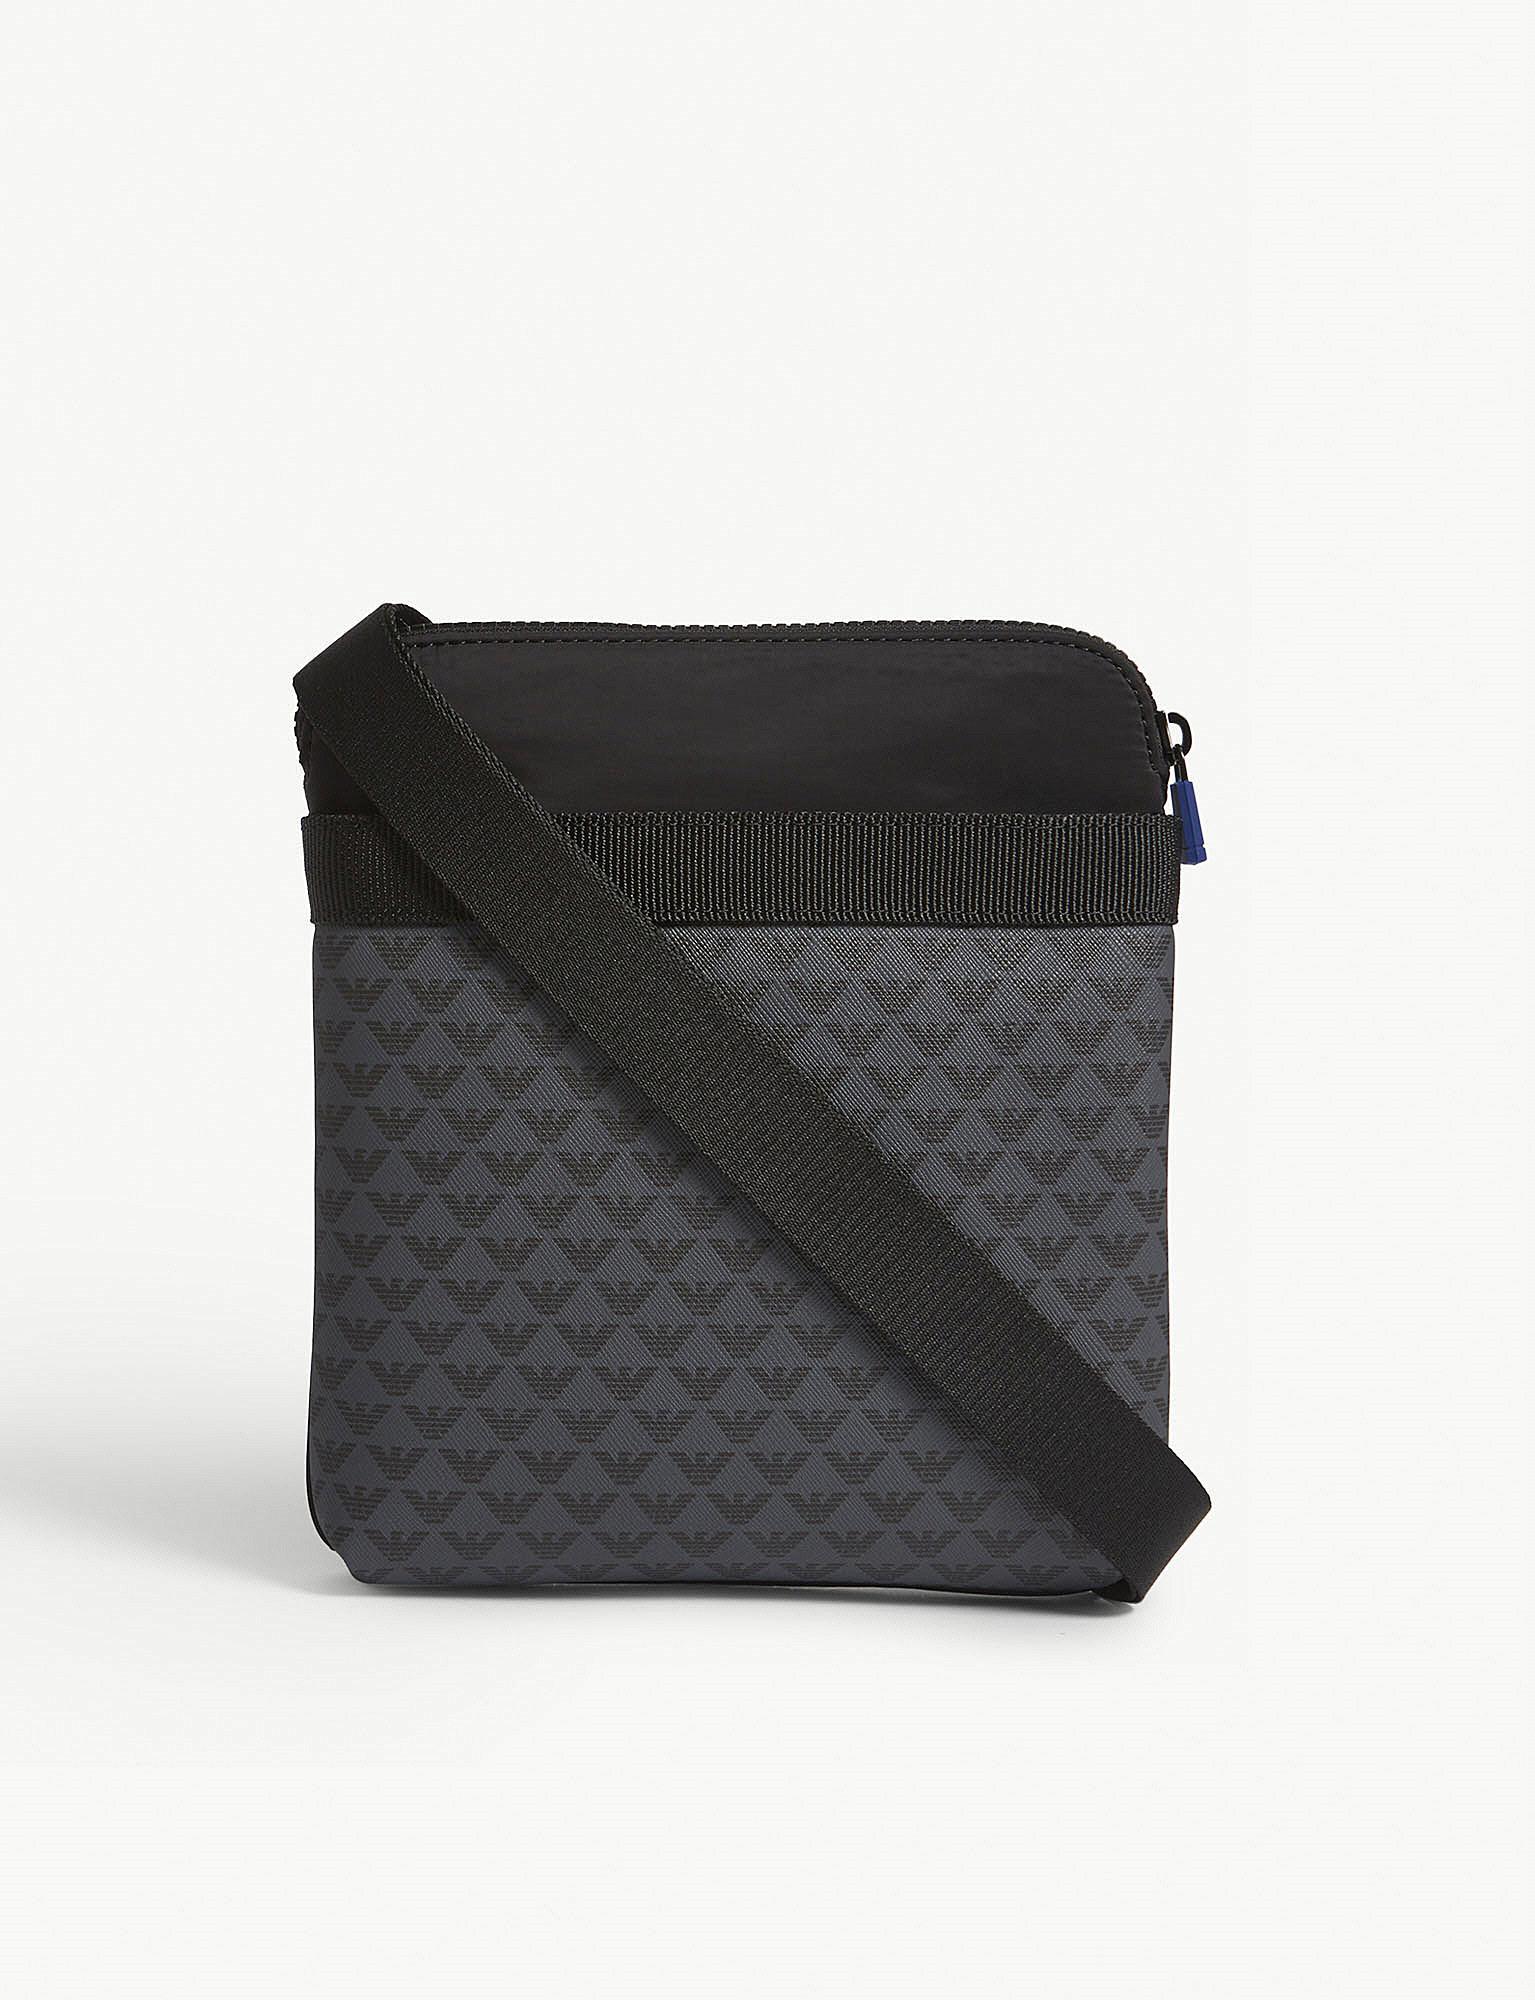 cb42d667e Emporio Armani Brand Logo Print Messenger Bag in Black for Men - Lyst